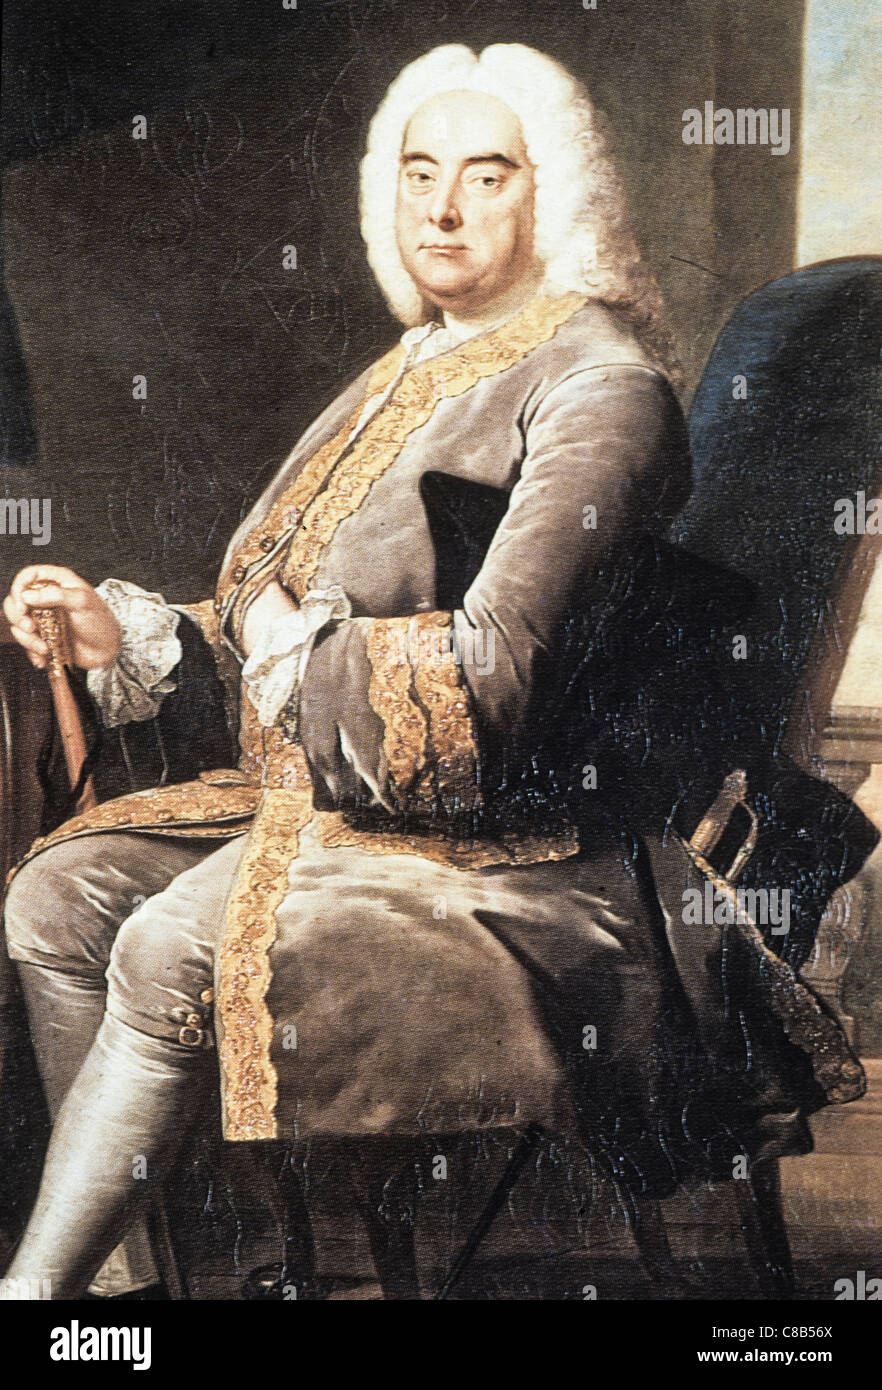 Georg Friedrich Handel - Stock Image